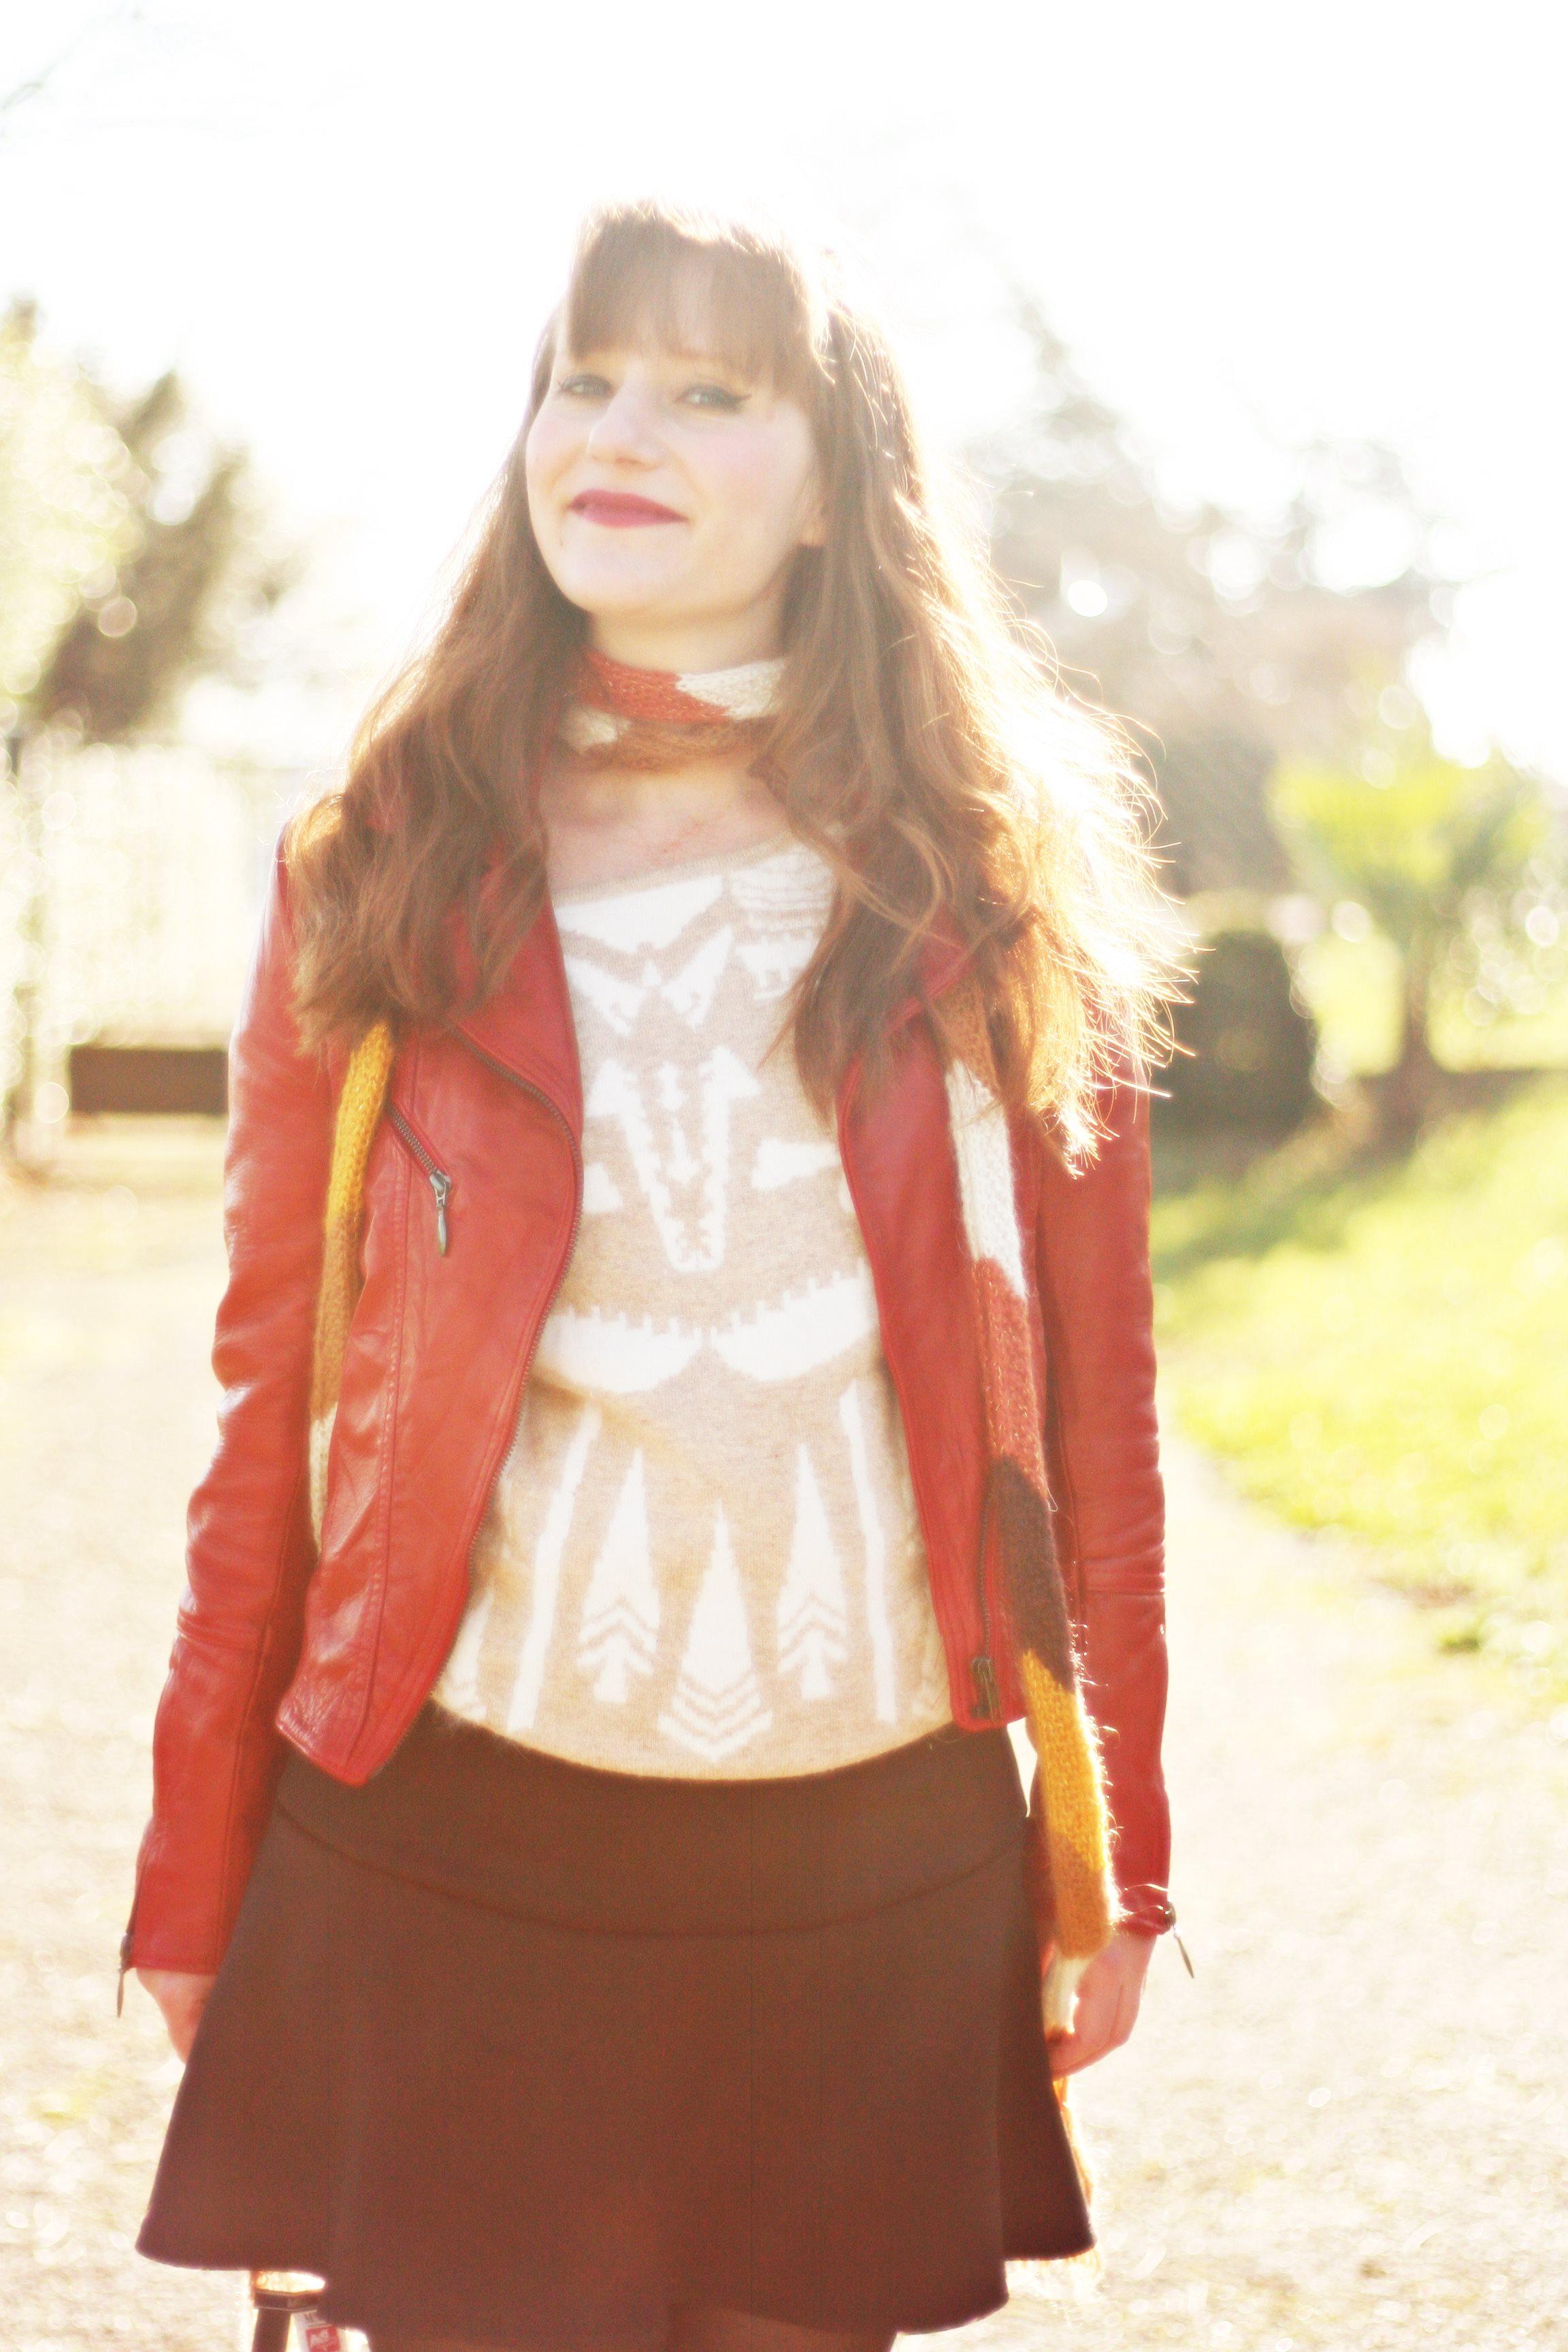 perfecto-DKS-look-perfecto-blog-mode-fashion-cuir